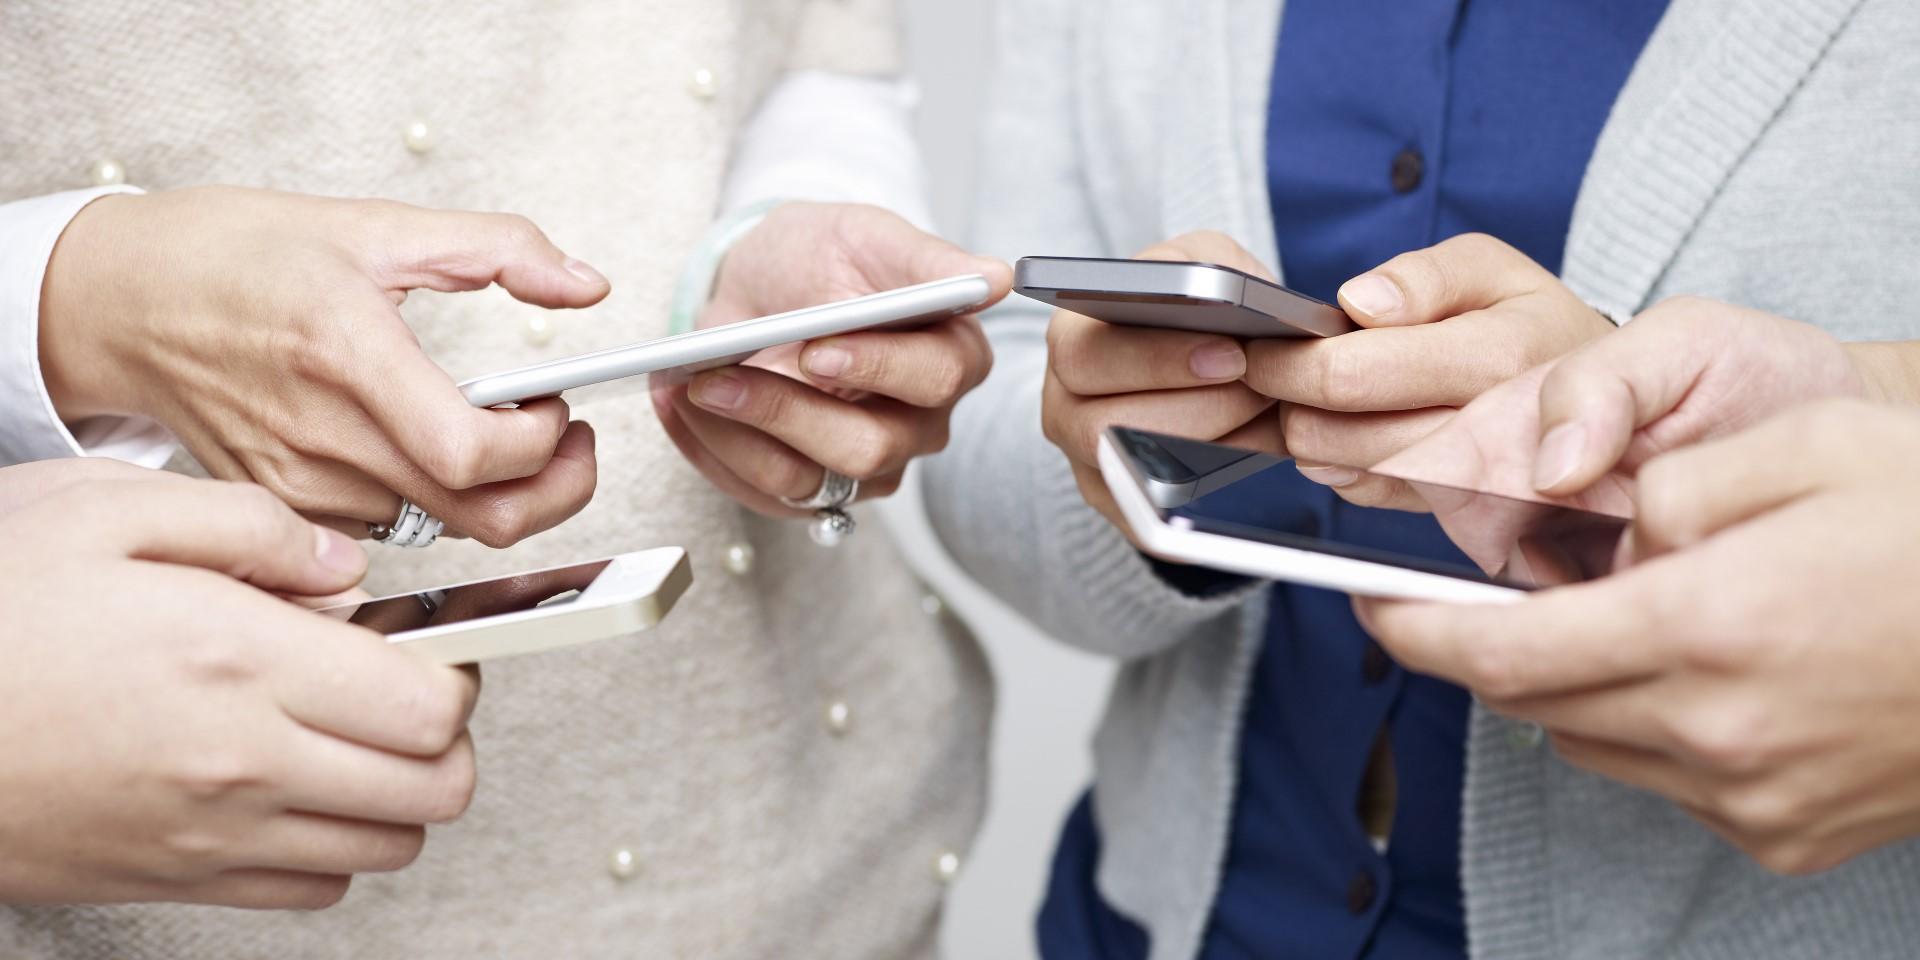 cellphones-Large.jpg